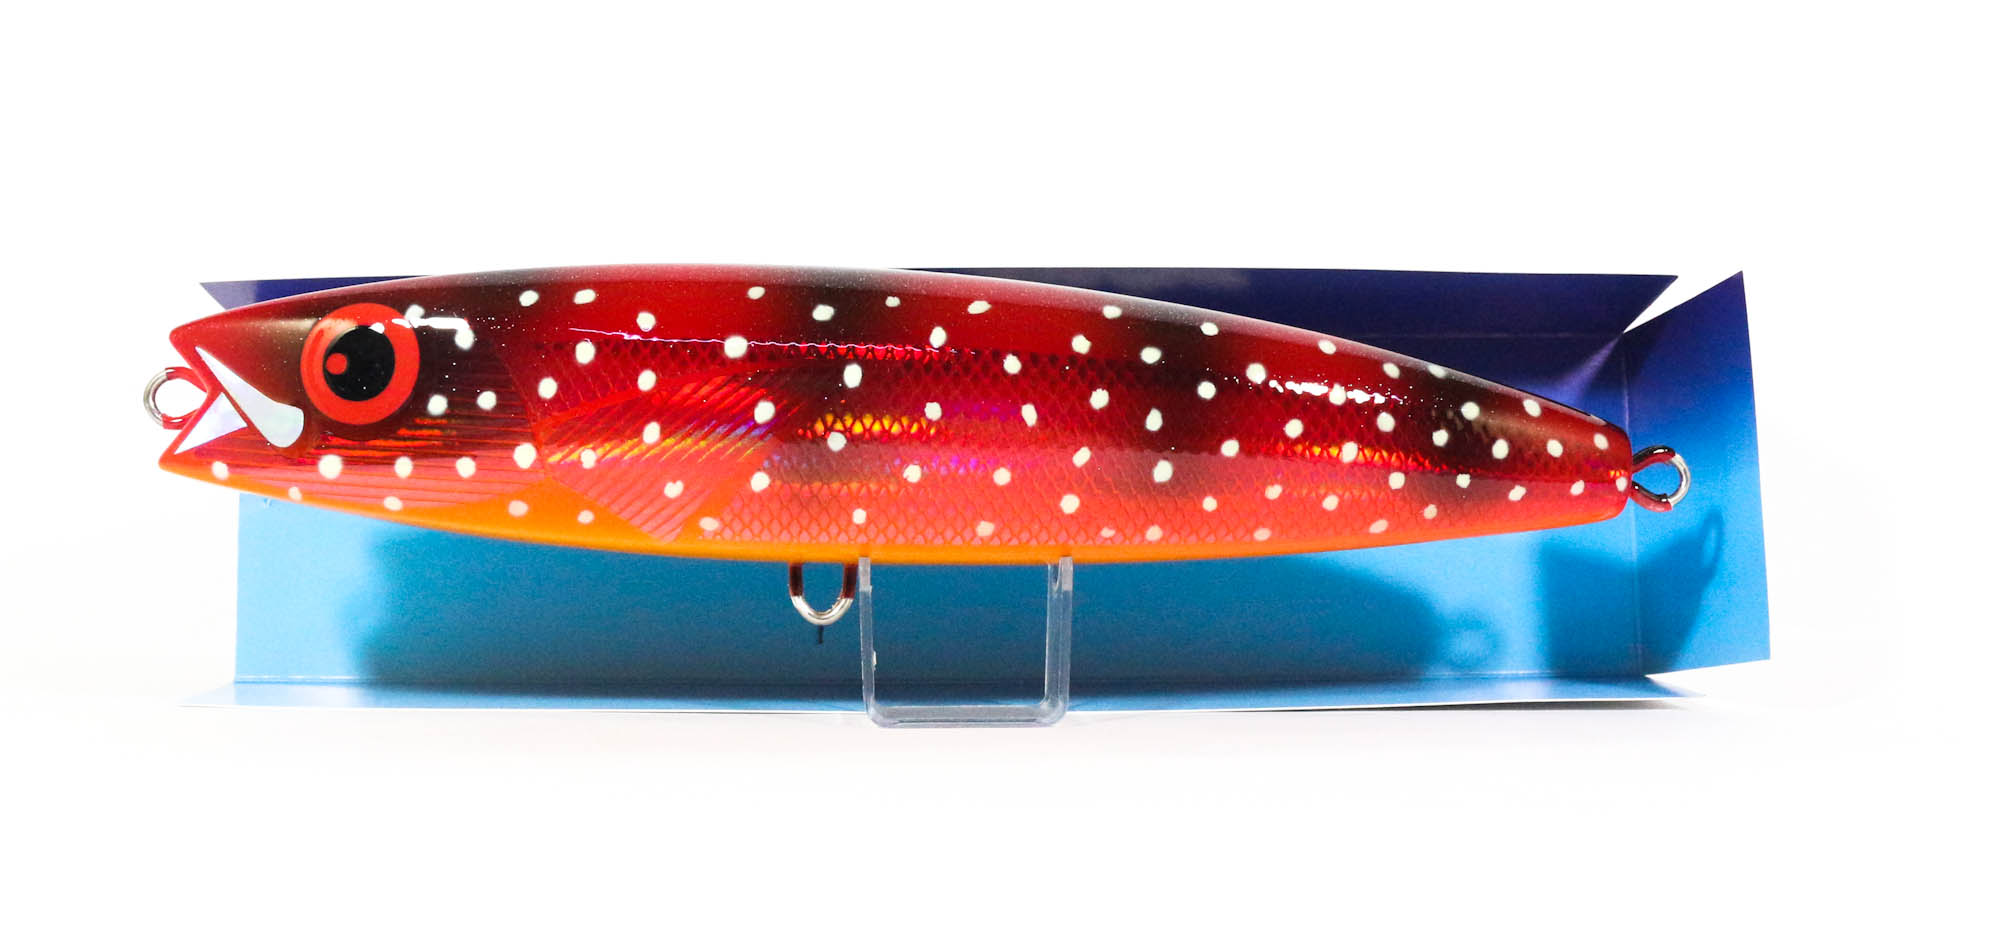 Sale FCL Labo Stick Bait CSP EXT 230F Floating Lure 165 grams BA (9240)